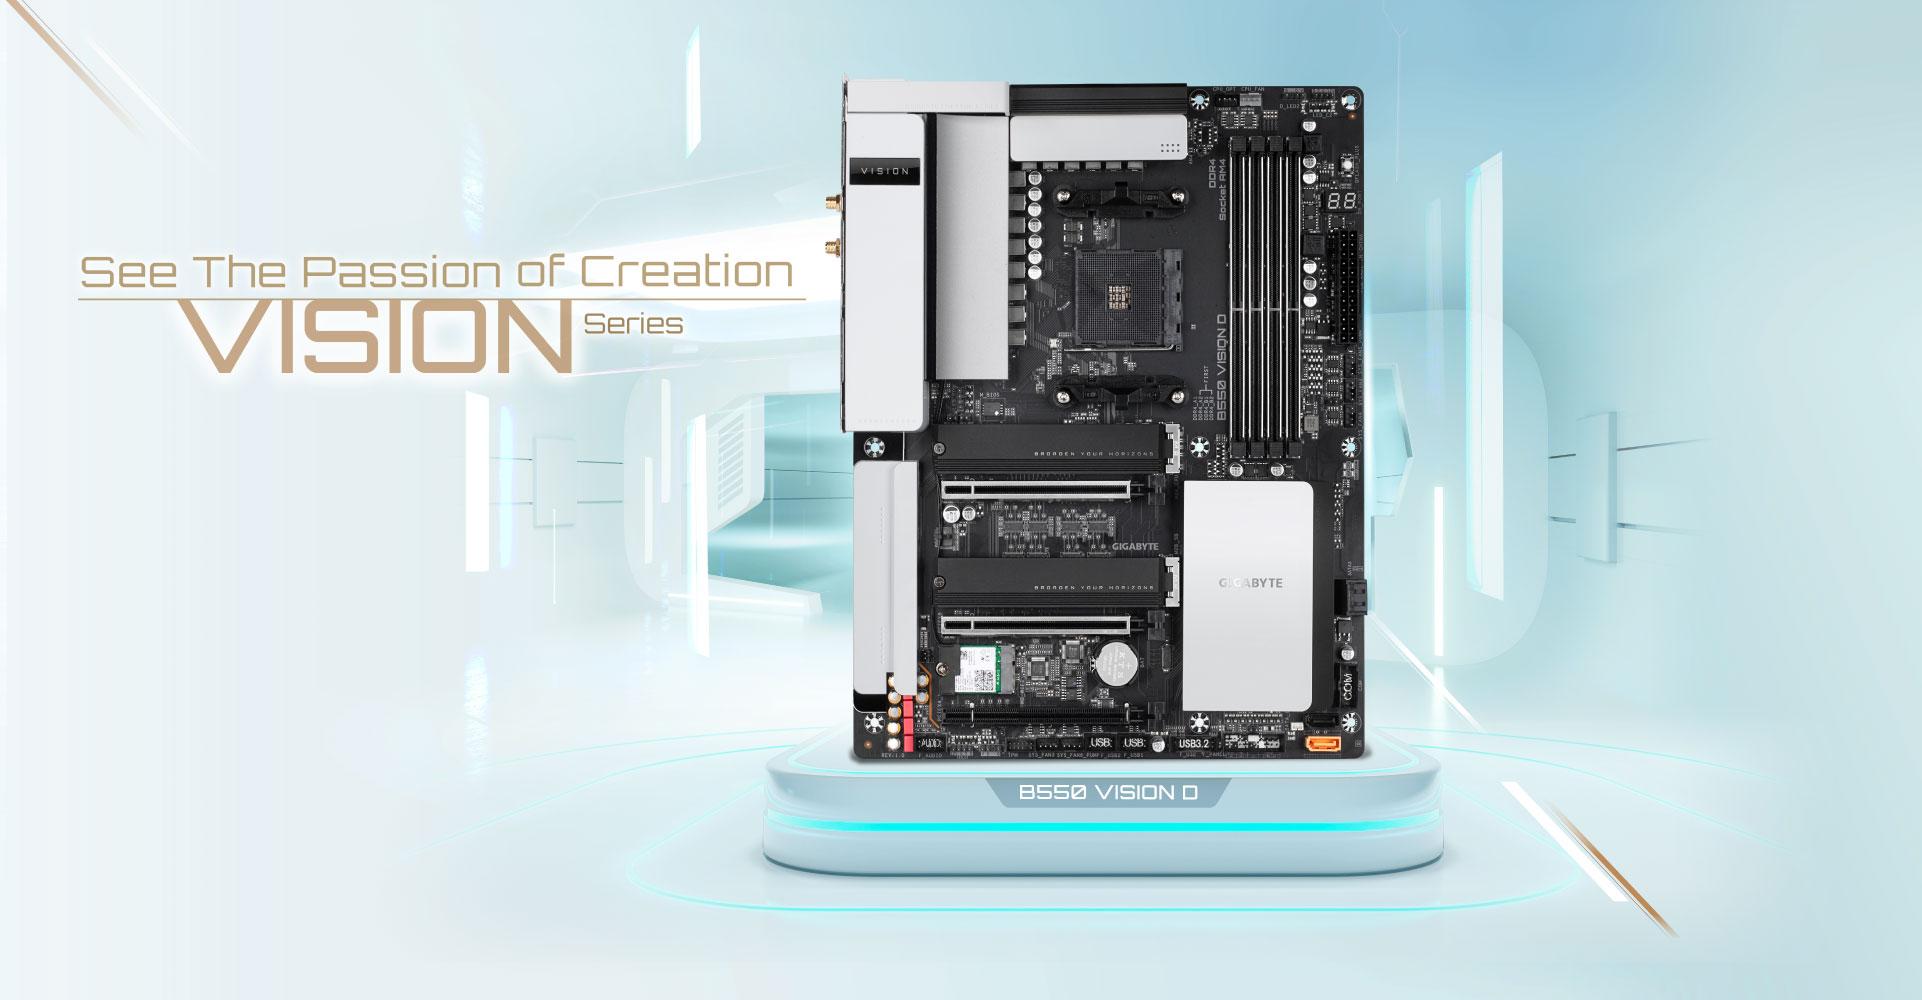 B550 Vision D Rev 1 0 Key Features Motherboard Gigabyte Global